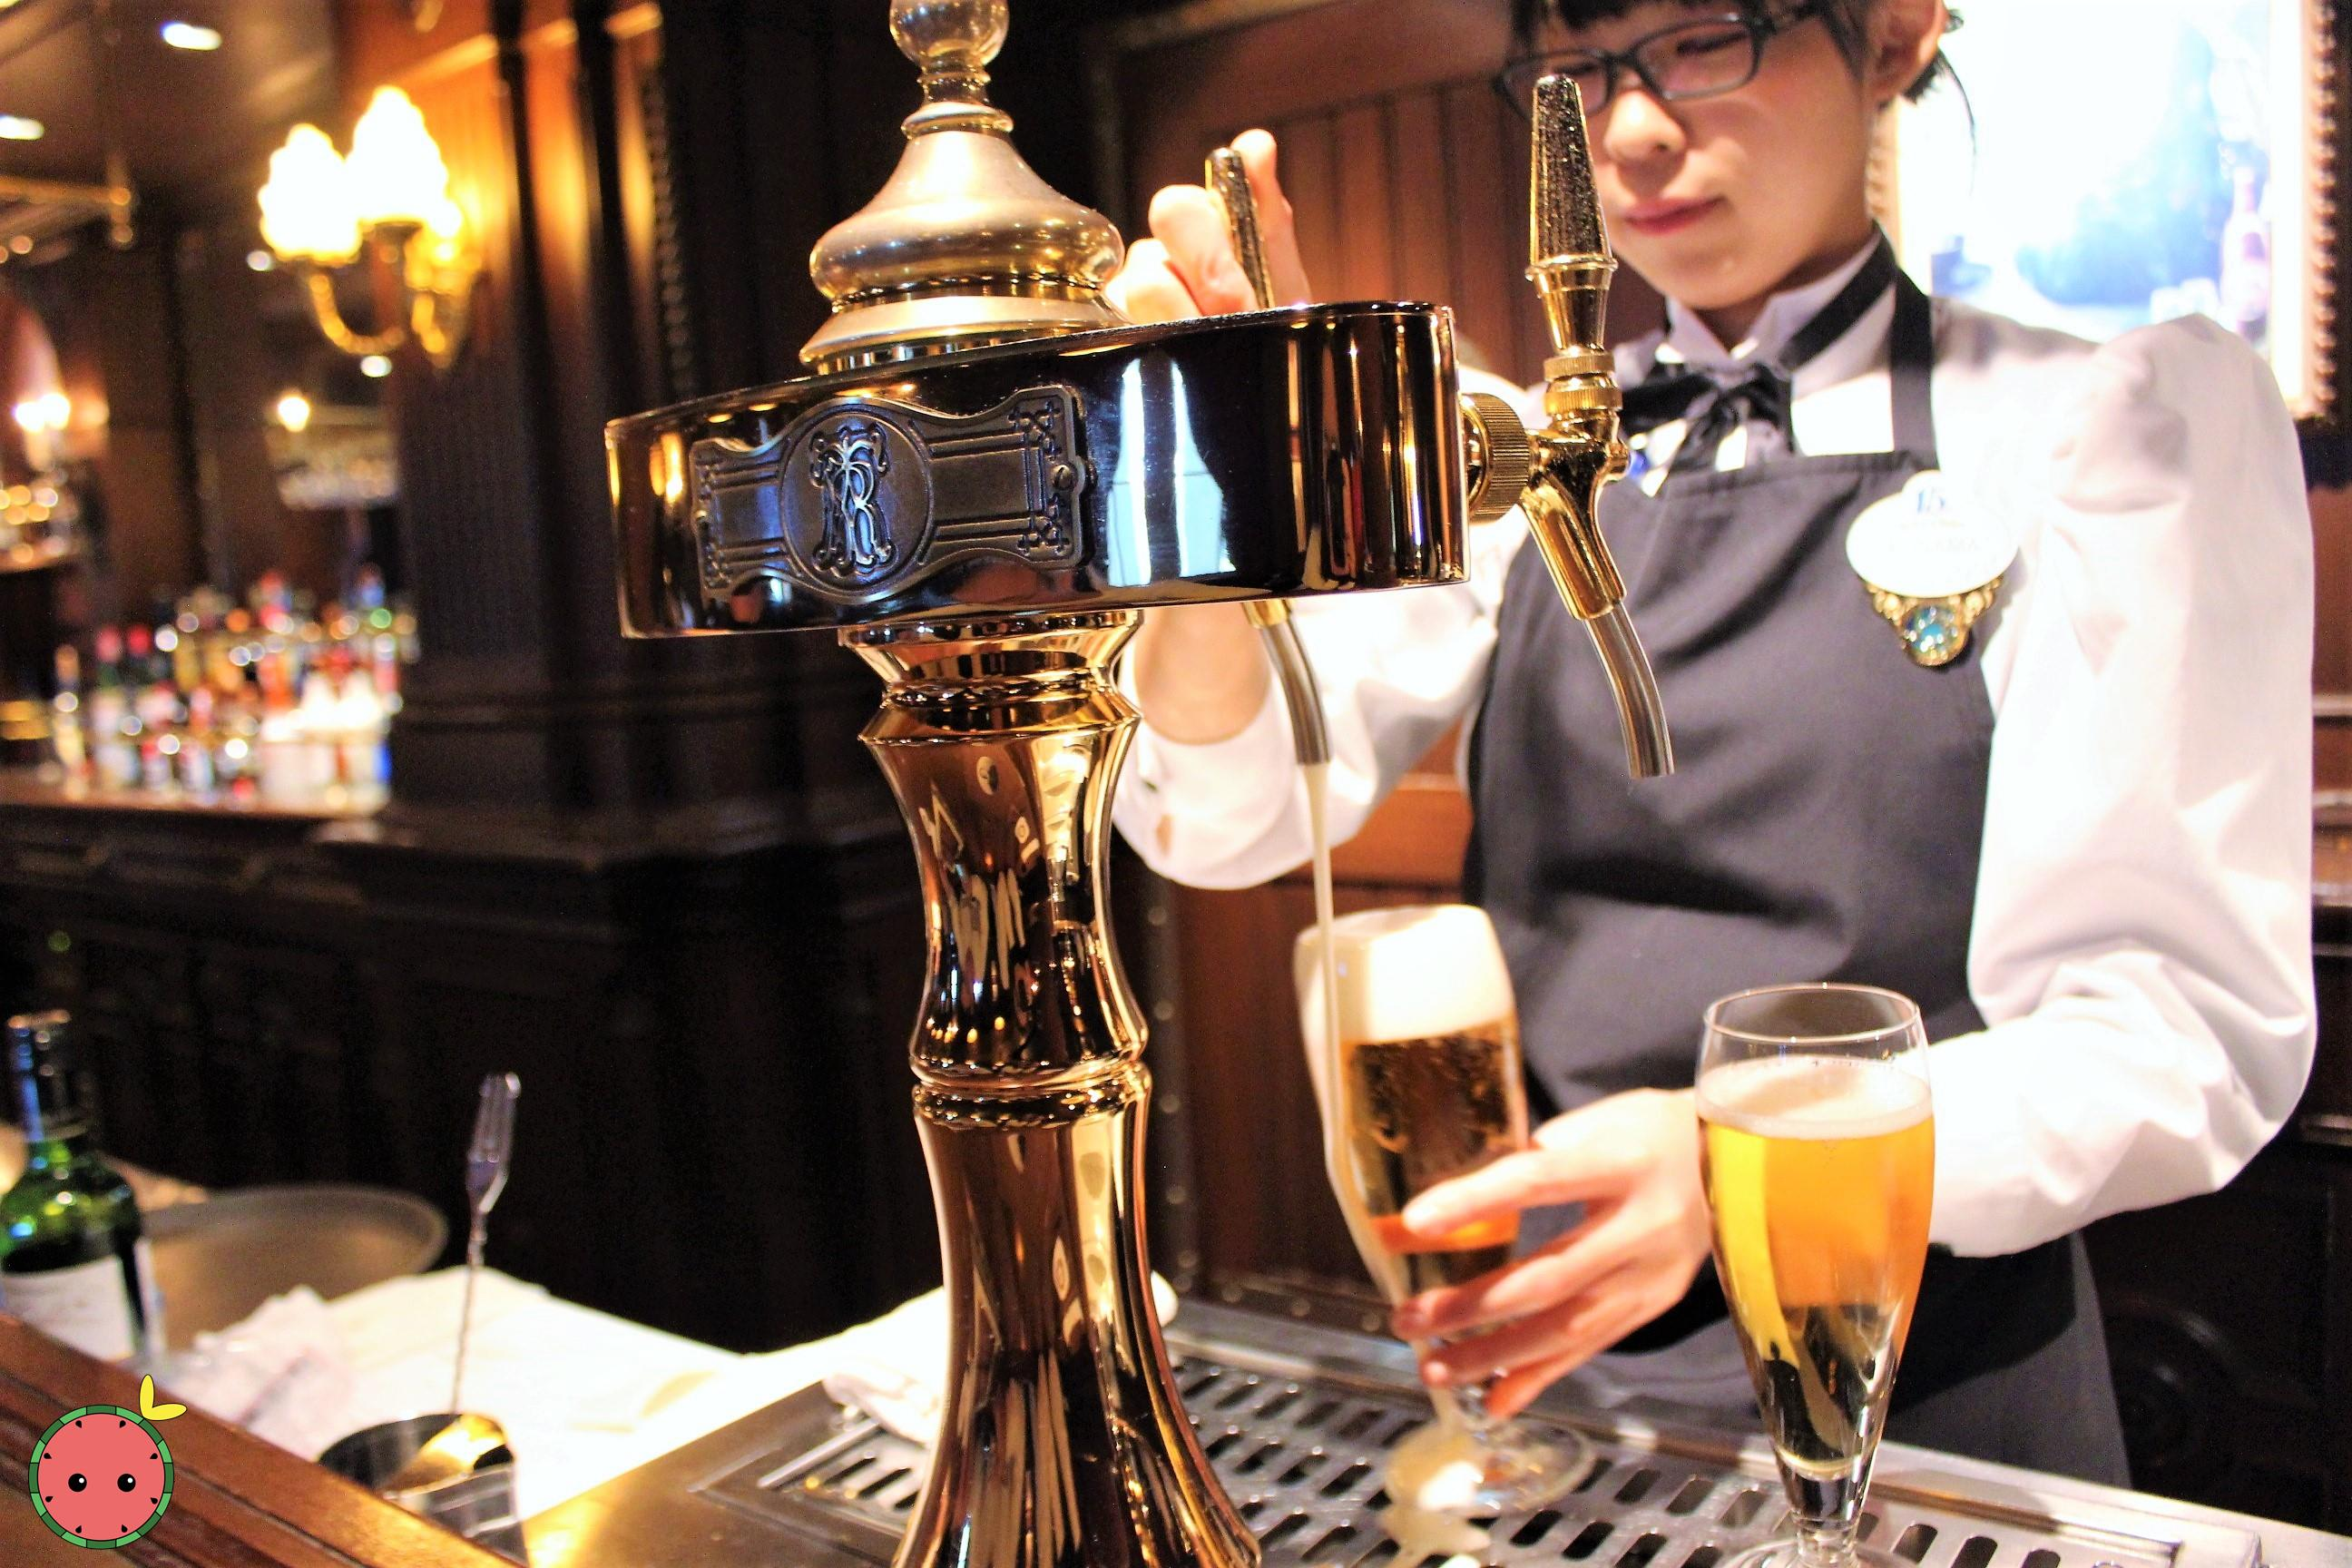 The Teddy Roosevelt Lounge Beer Dispenser